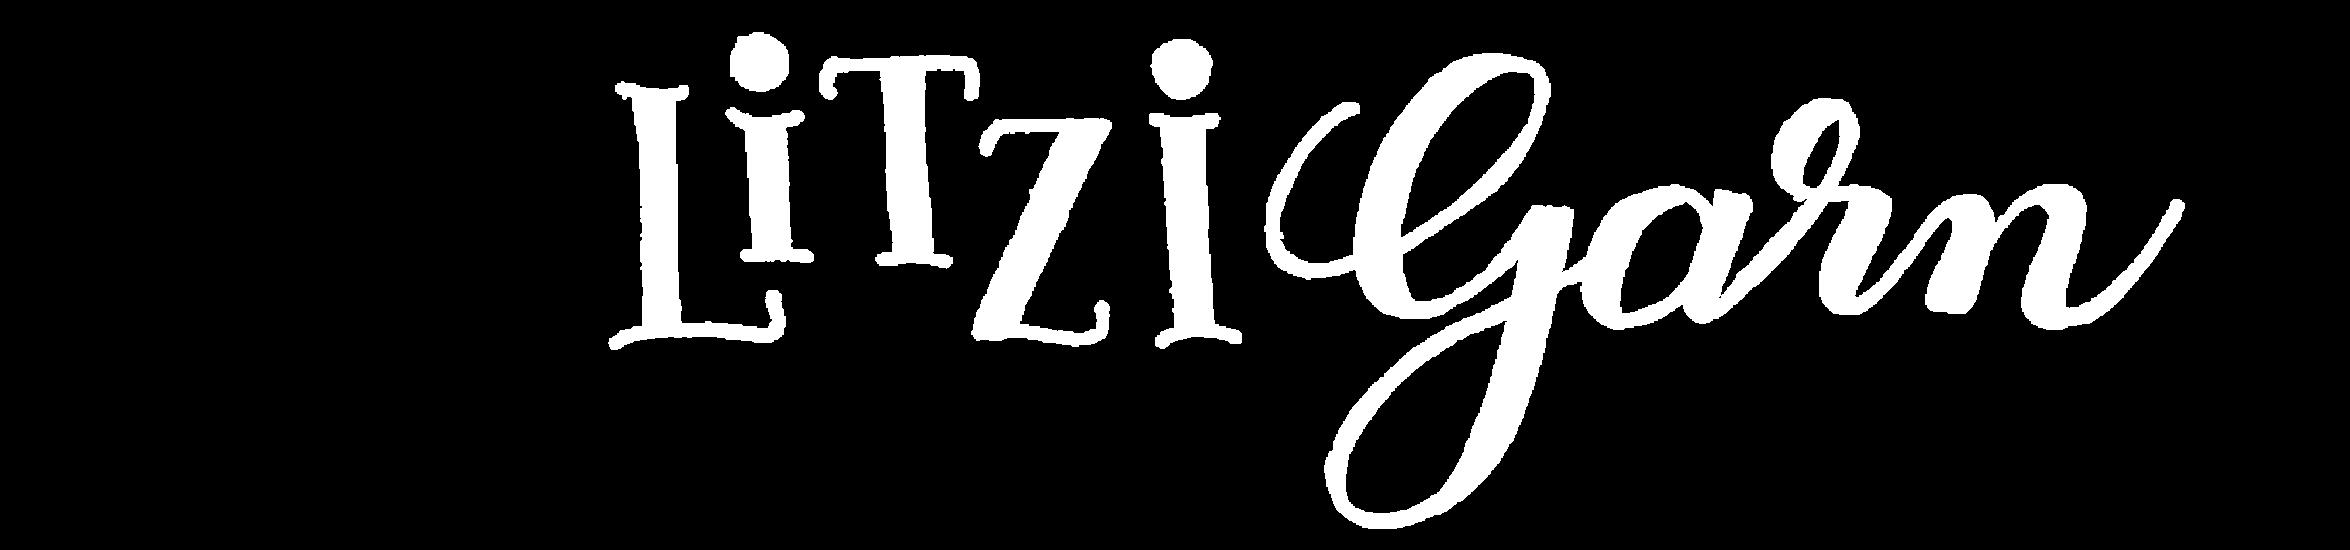 Litzi Garn